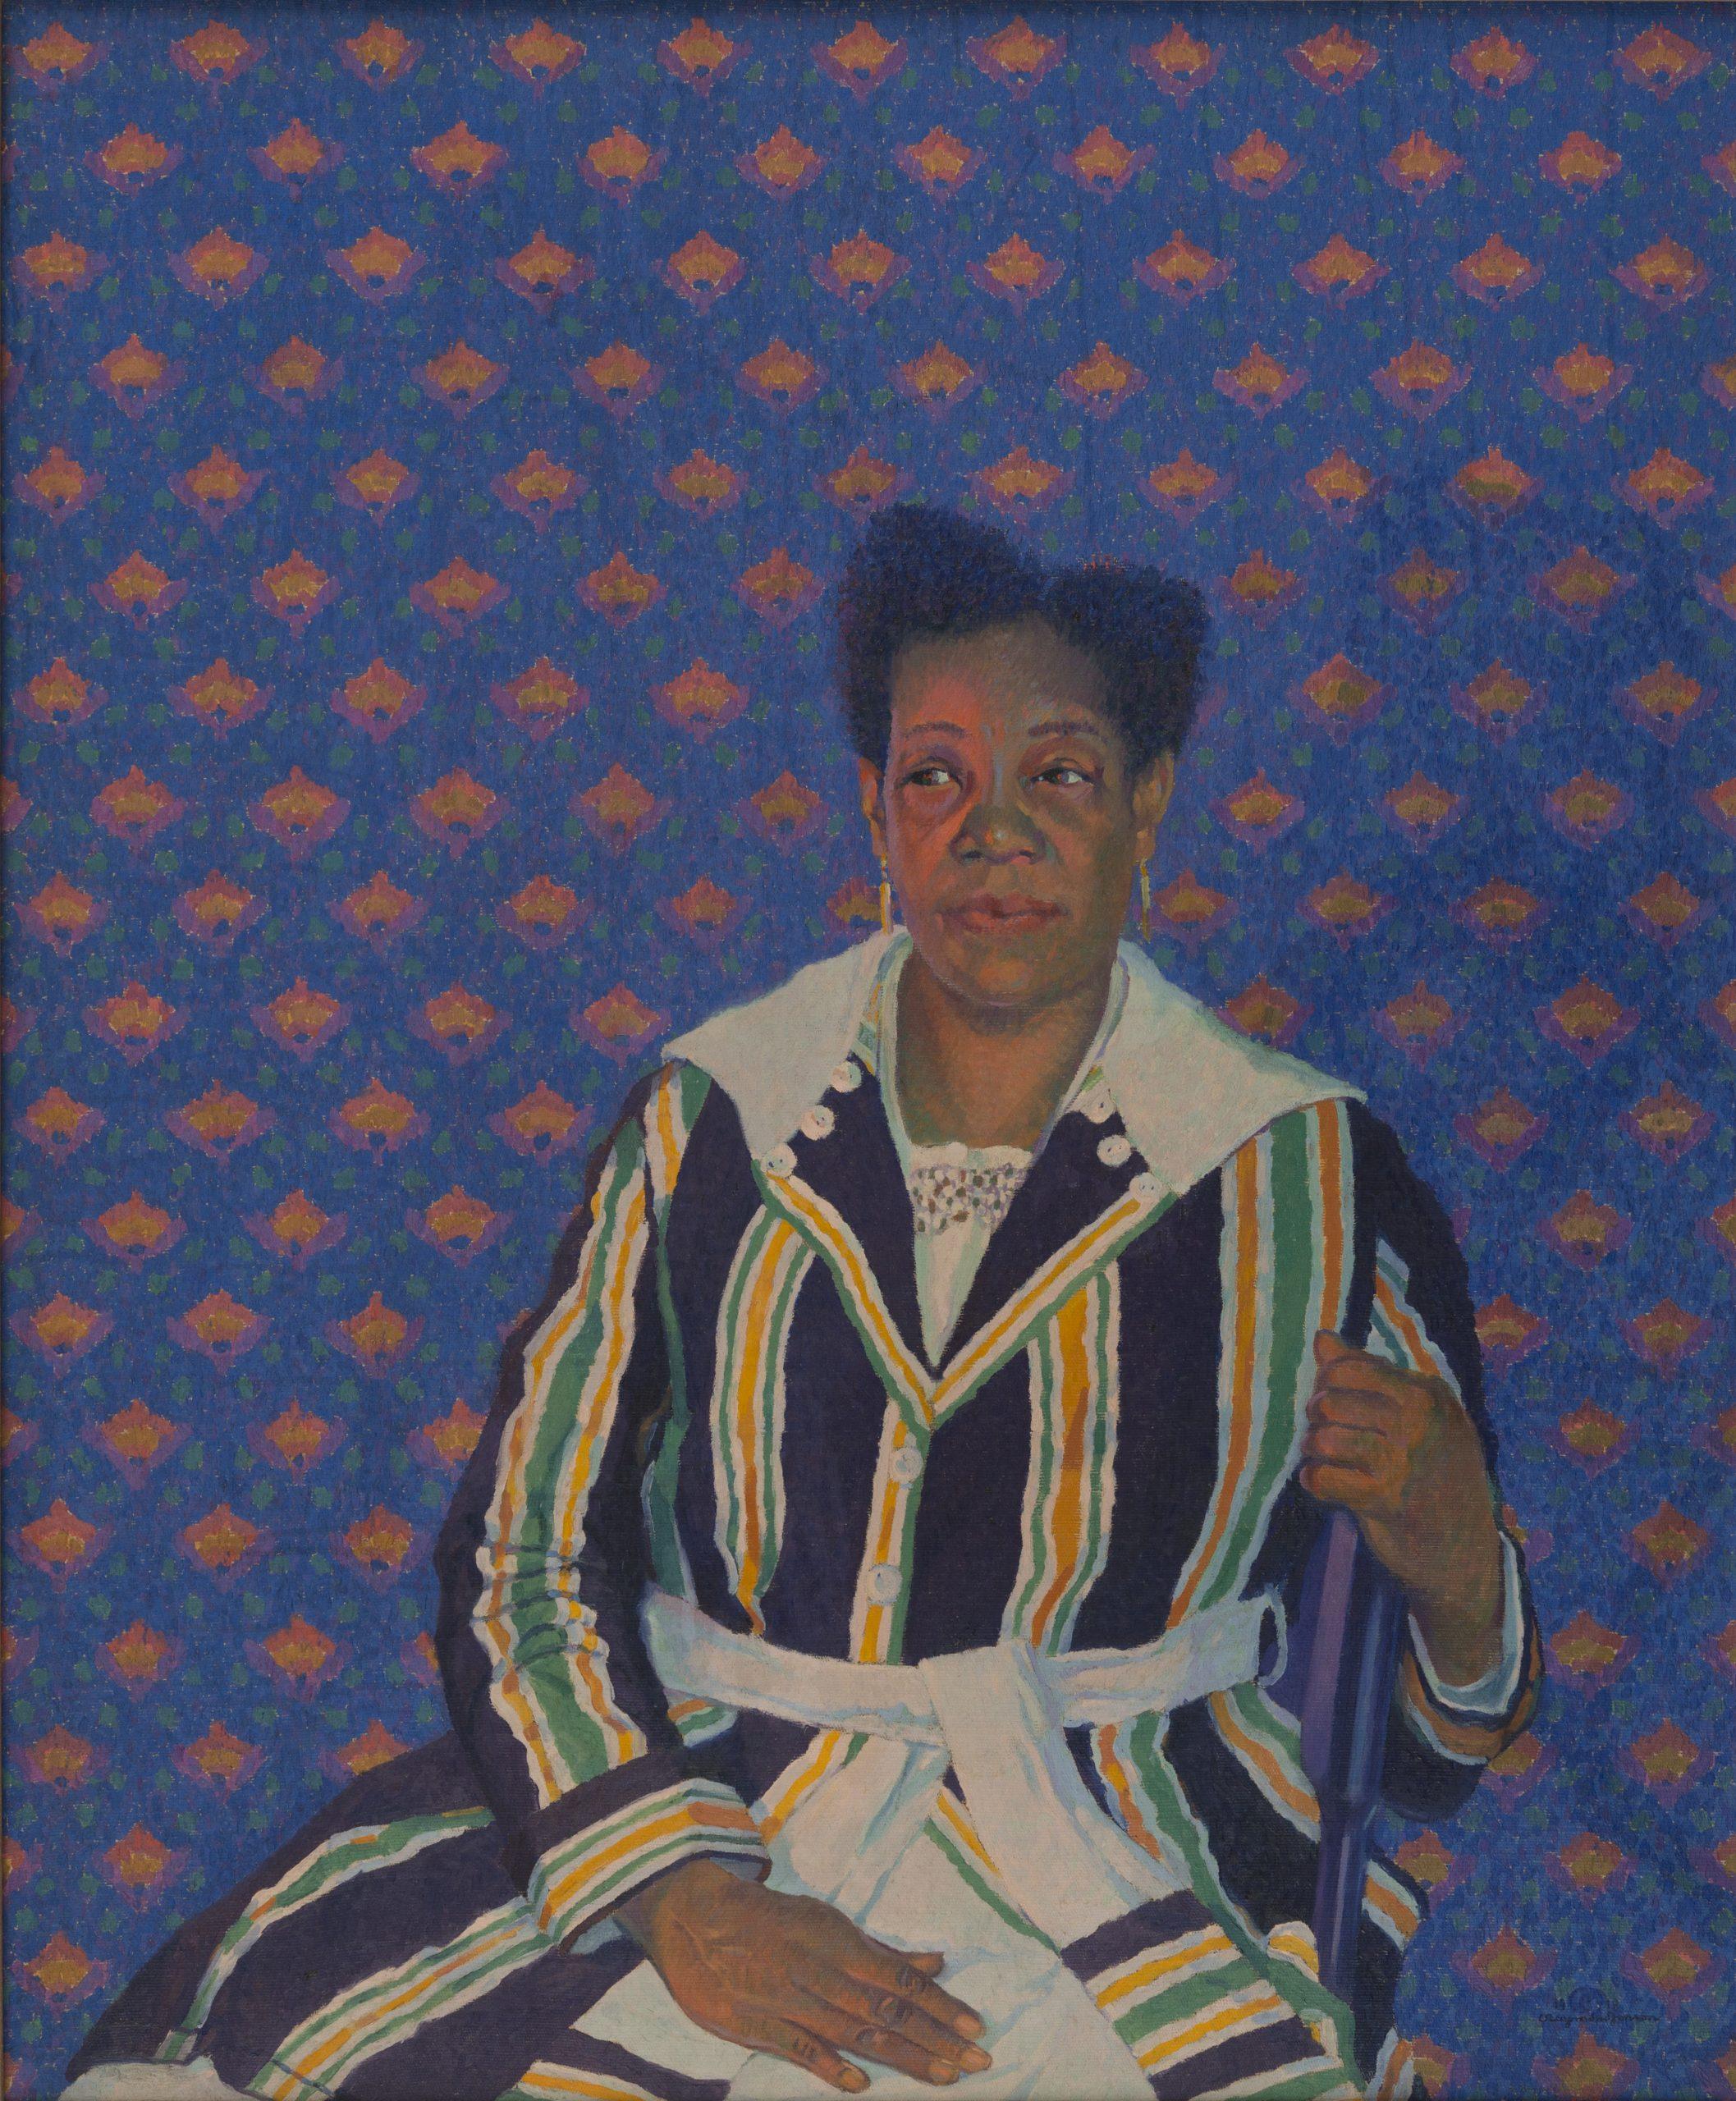 Negro Woman (Mrs. Gates), 1918, Oil on canvas, Bequest of Raymond Jonson, Raymond Jonson Collection